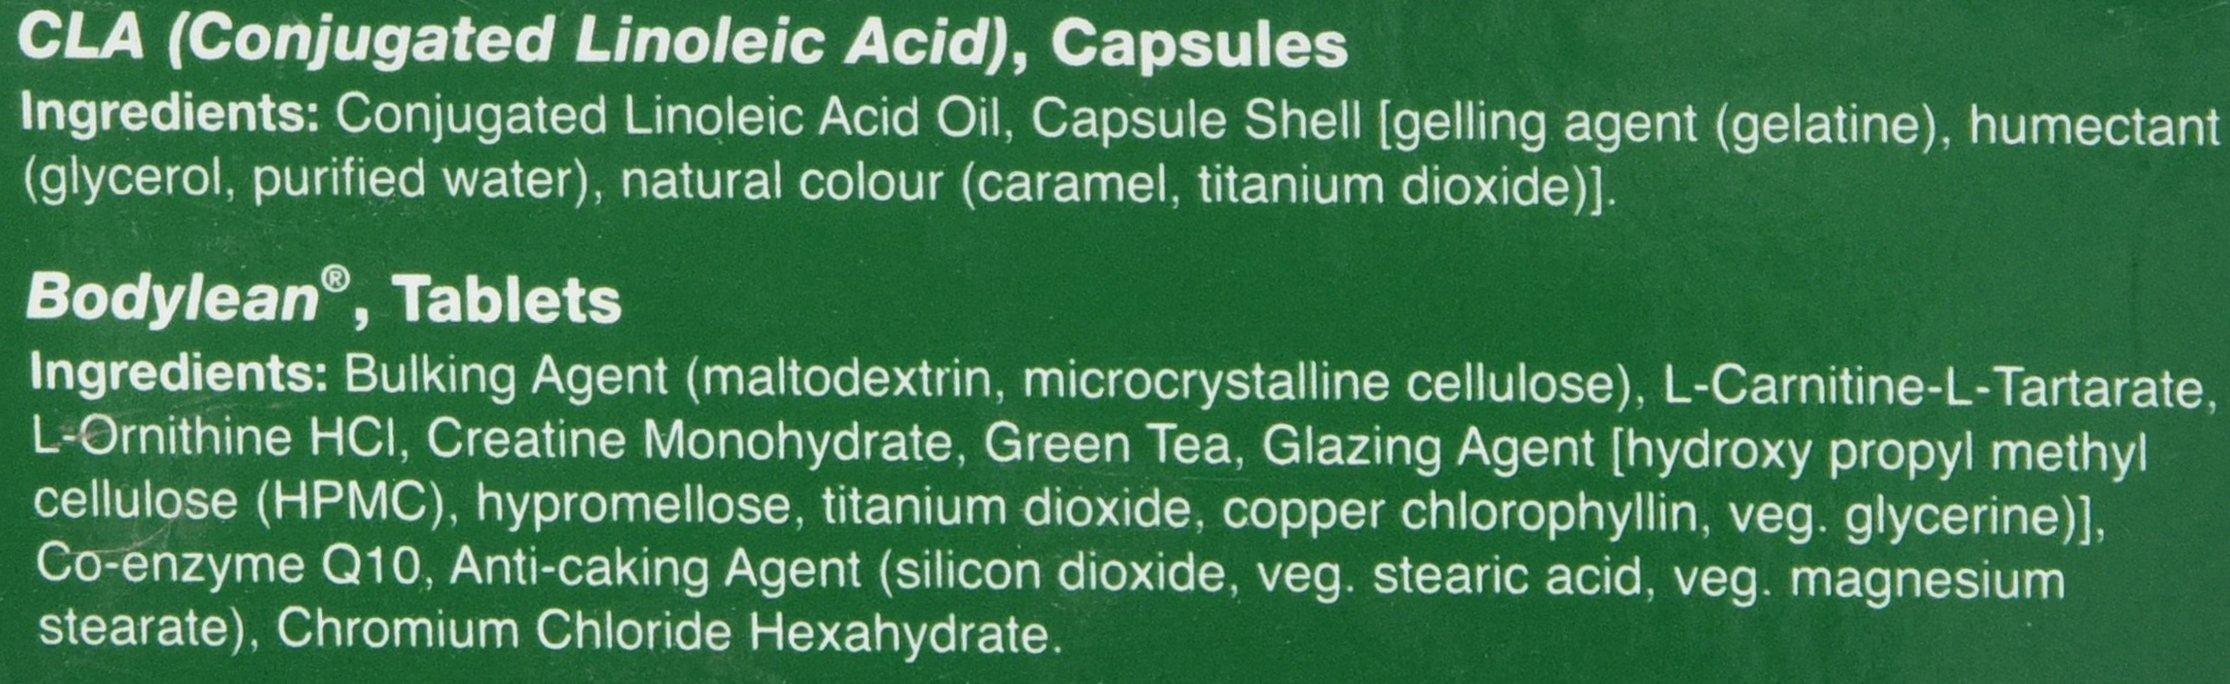 HealthAid Bodylean CLA Plus – (Conjugated Linoleic Acid, Co Q10, Green Tea) – 30 Capsules and 30 Tablets